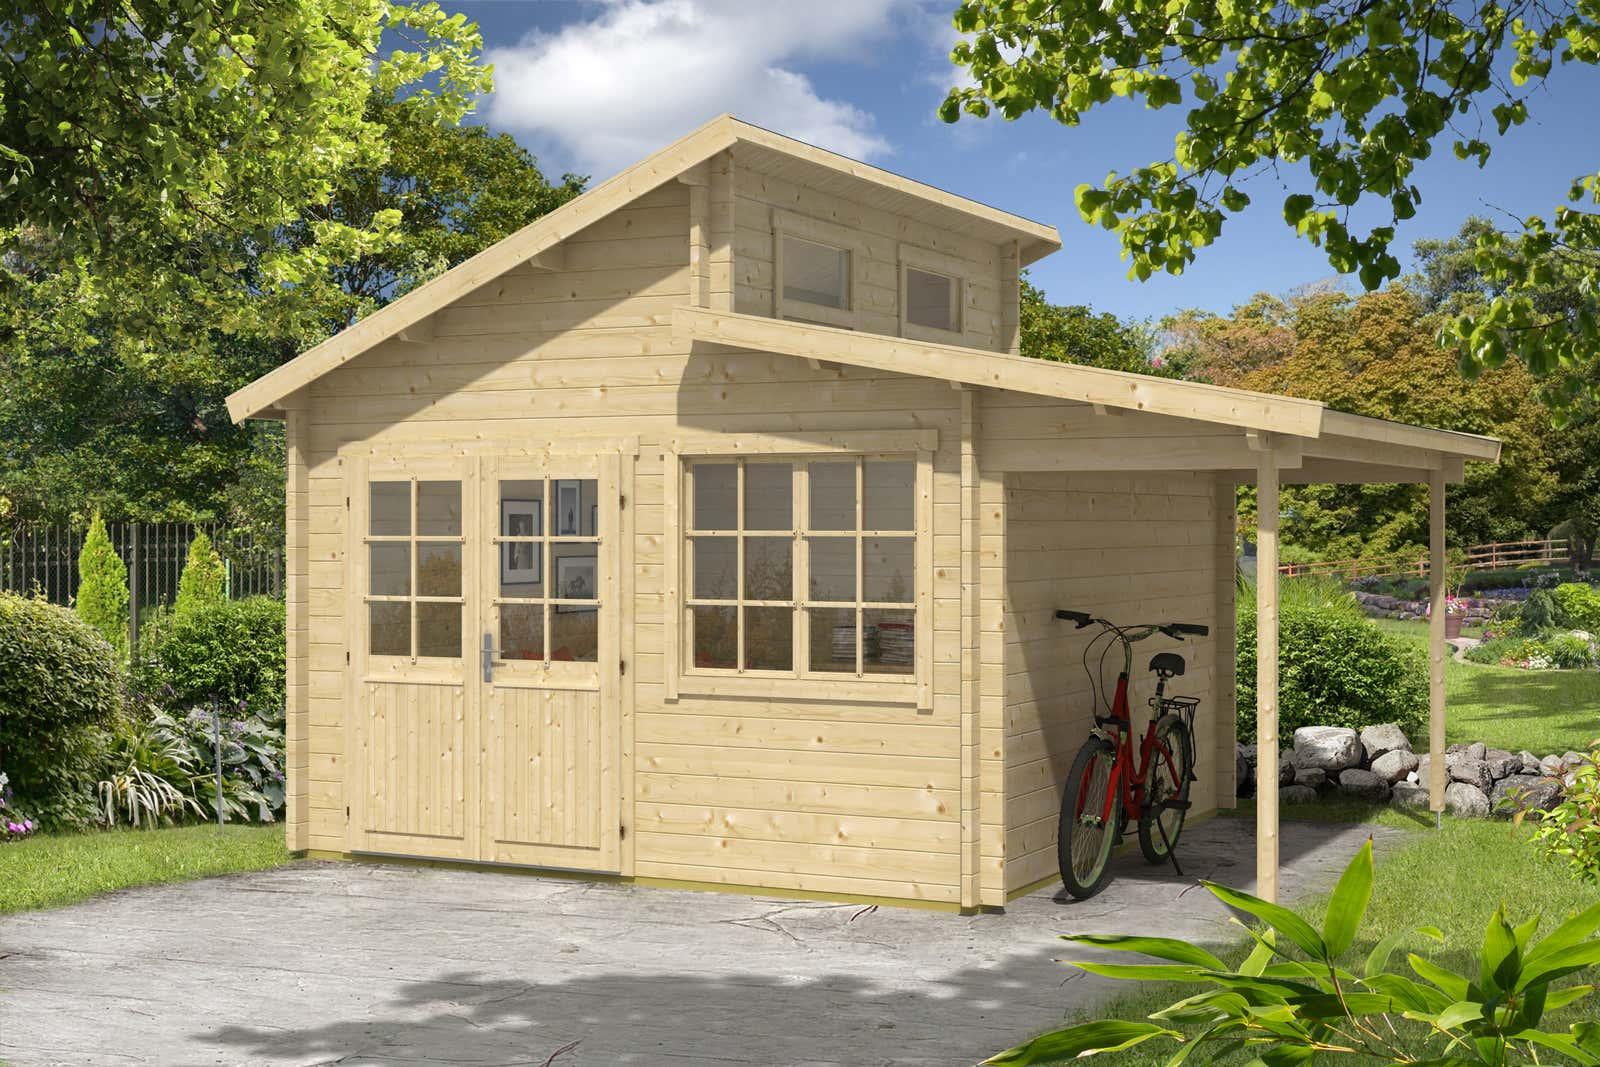 gartenhaus bristol 44 a z gartenhaus gmbh. Black Bedroom Furniture Sets. Home Design Ideas